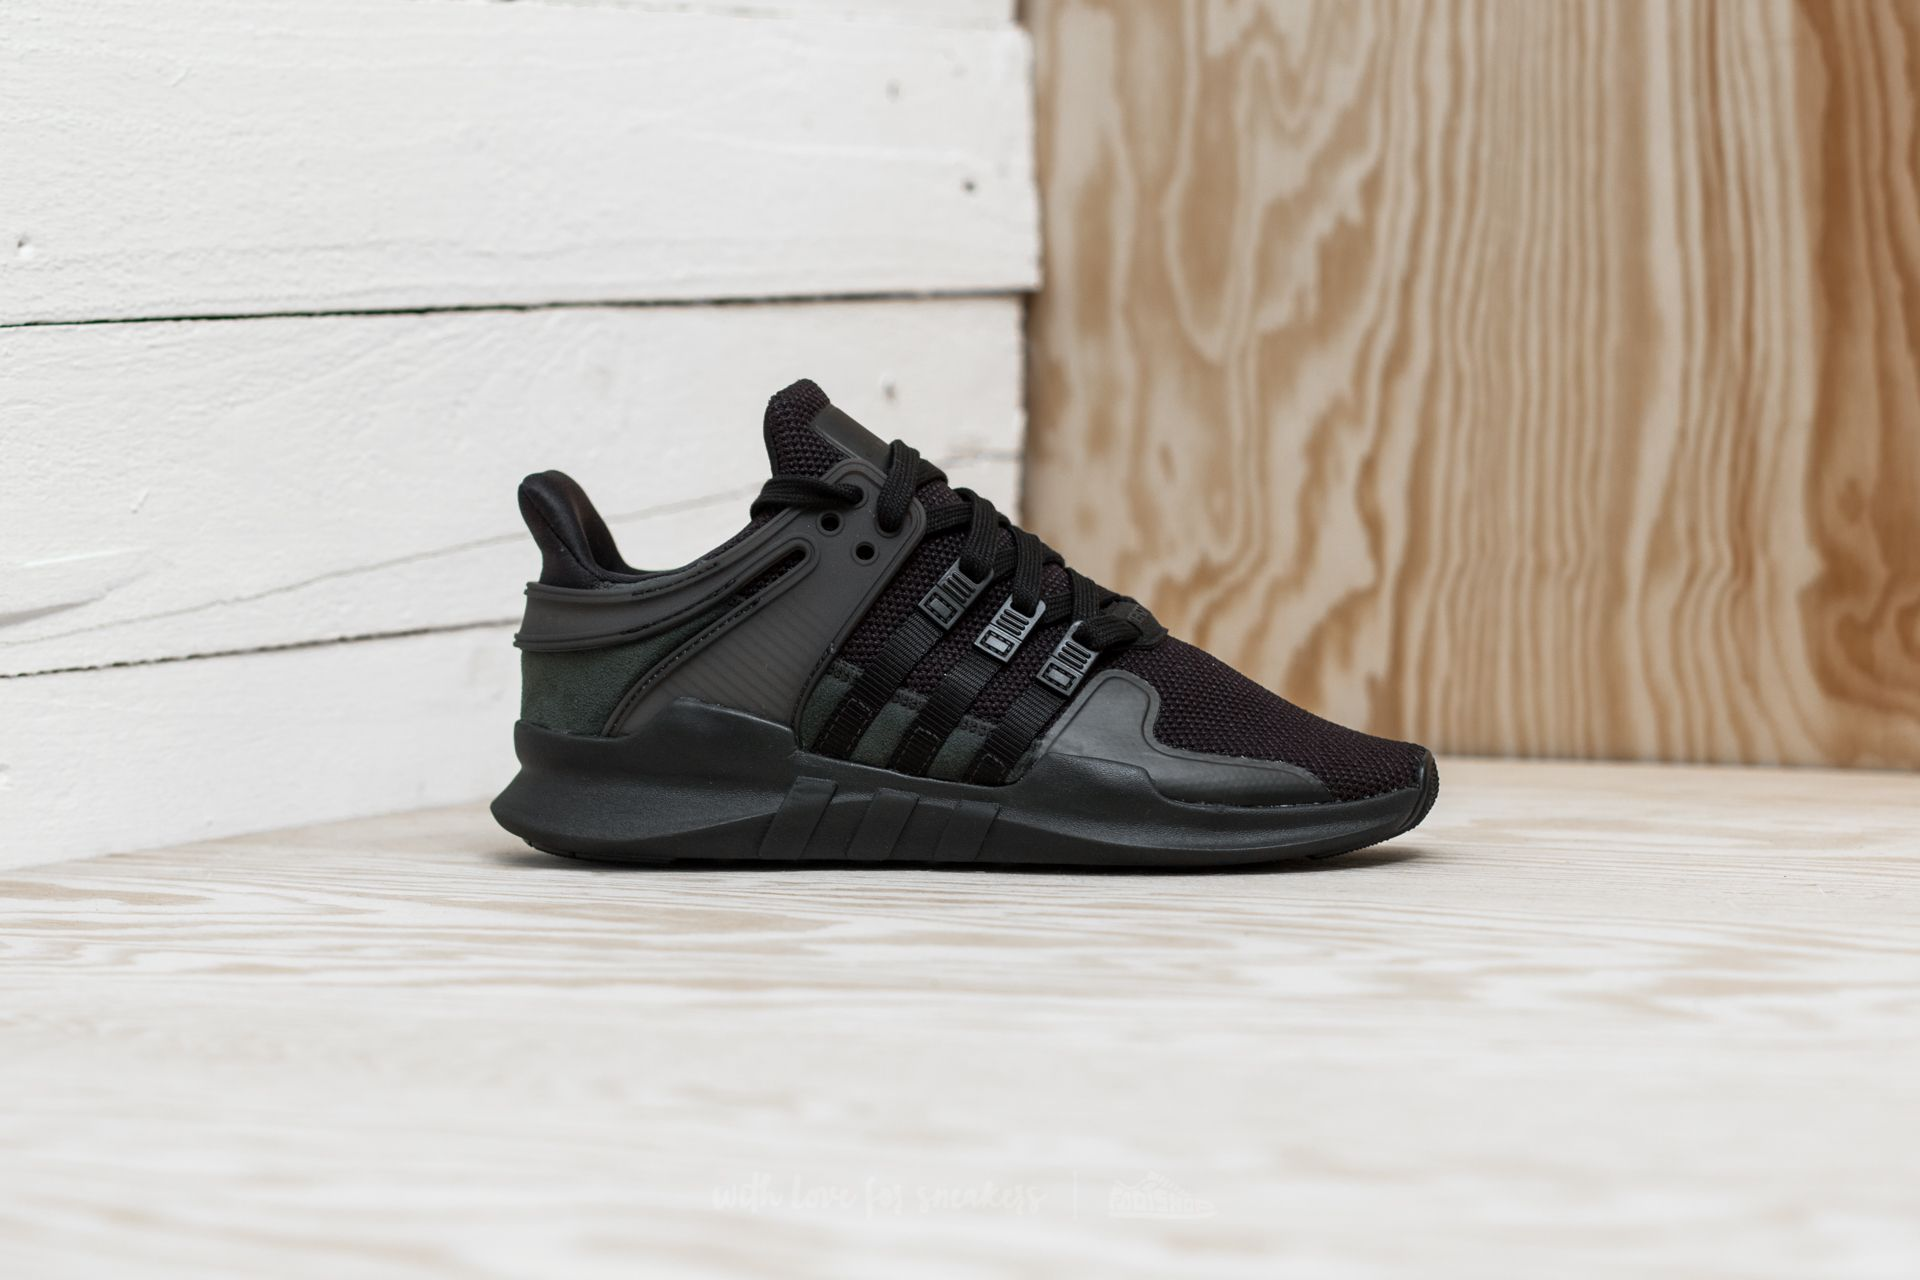 9da0f1c279a adidas EQT Support ADV W Core Black/ Core Black/ Sub Green | Footshop